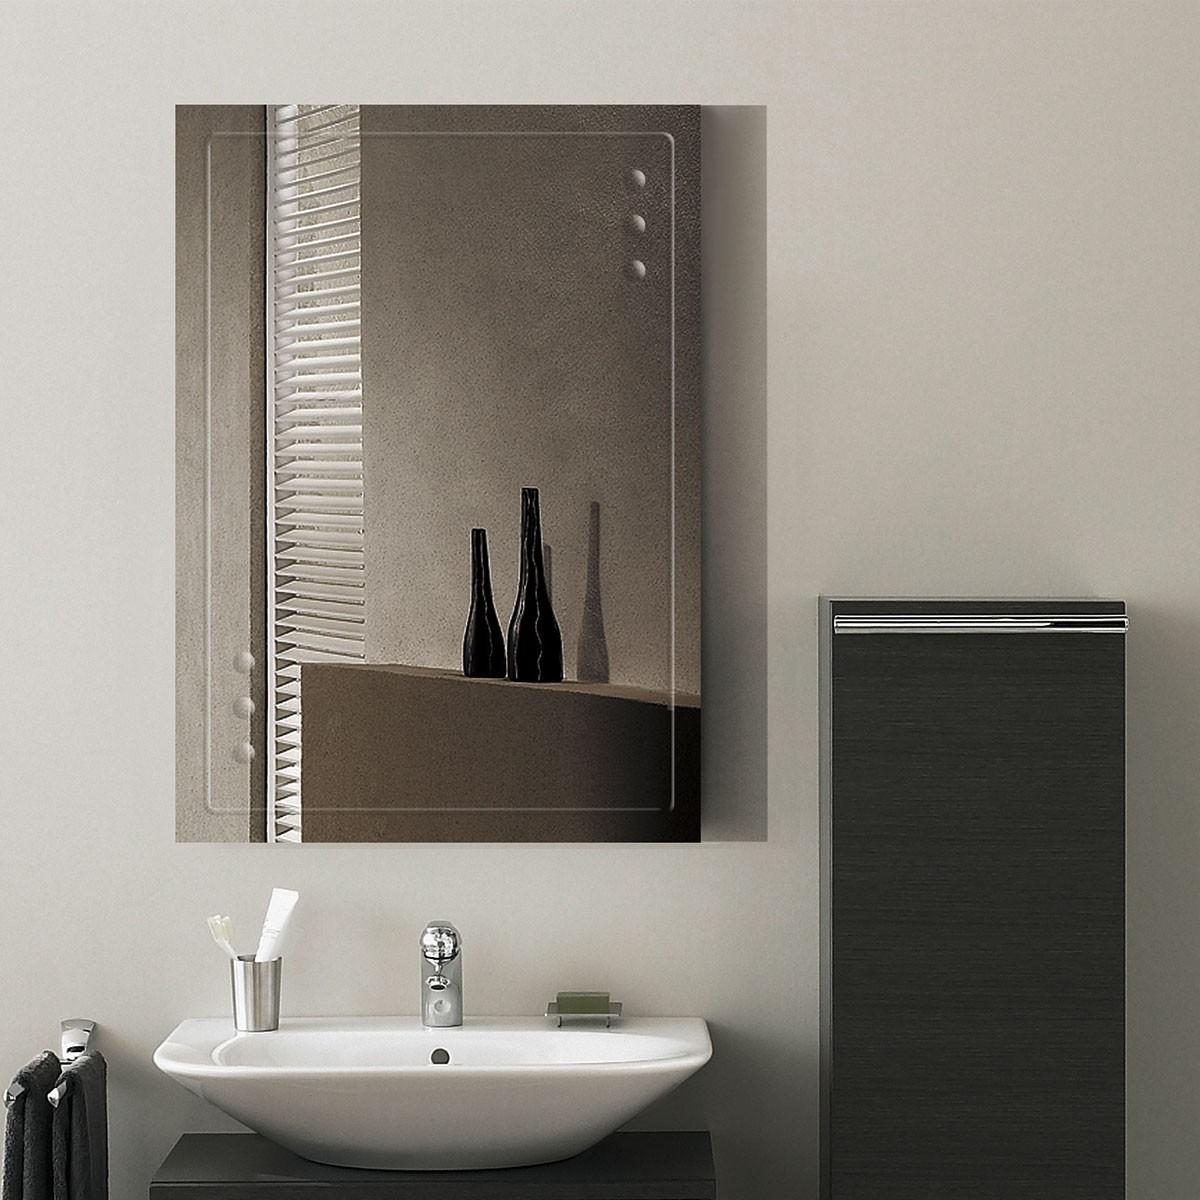 28 x 20 In. Wall-mounted Rectangle Bathroom Mirror (DK-OD-B047B)